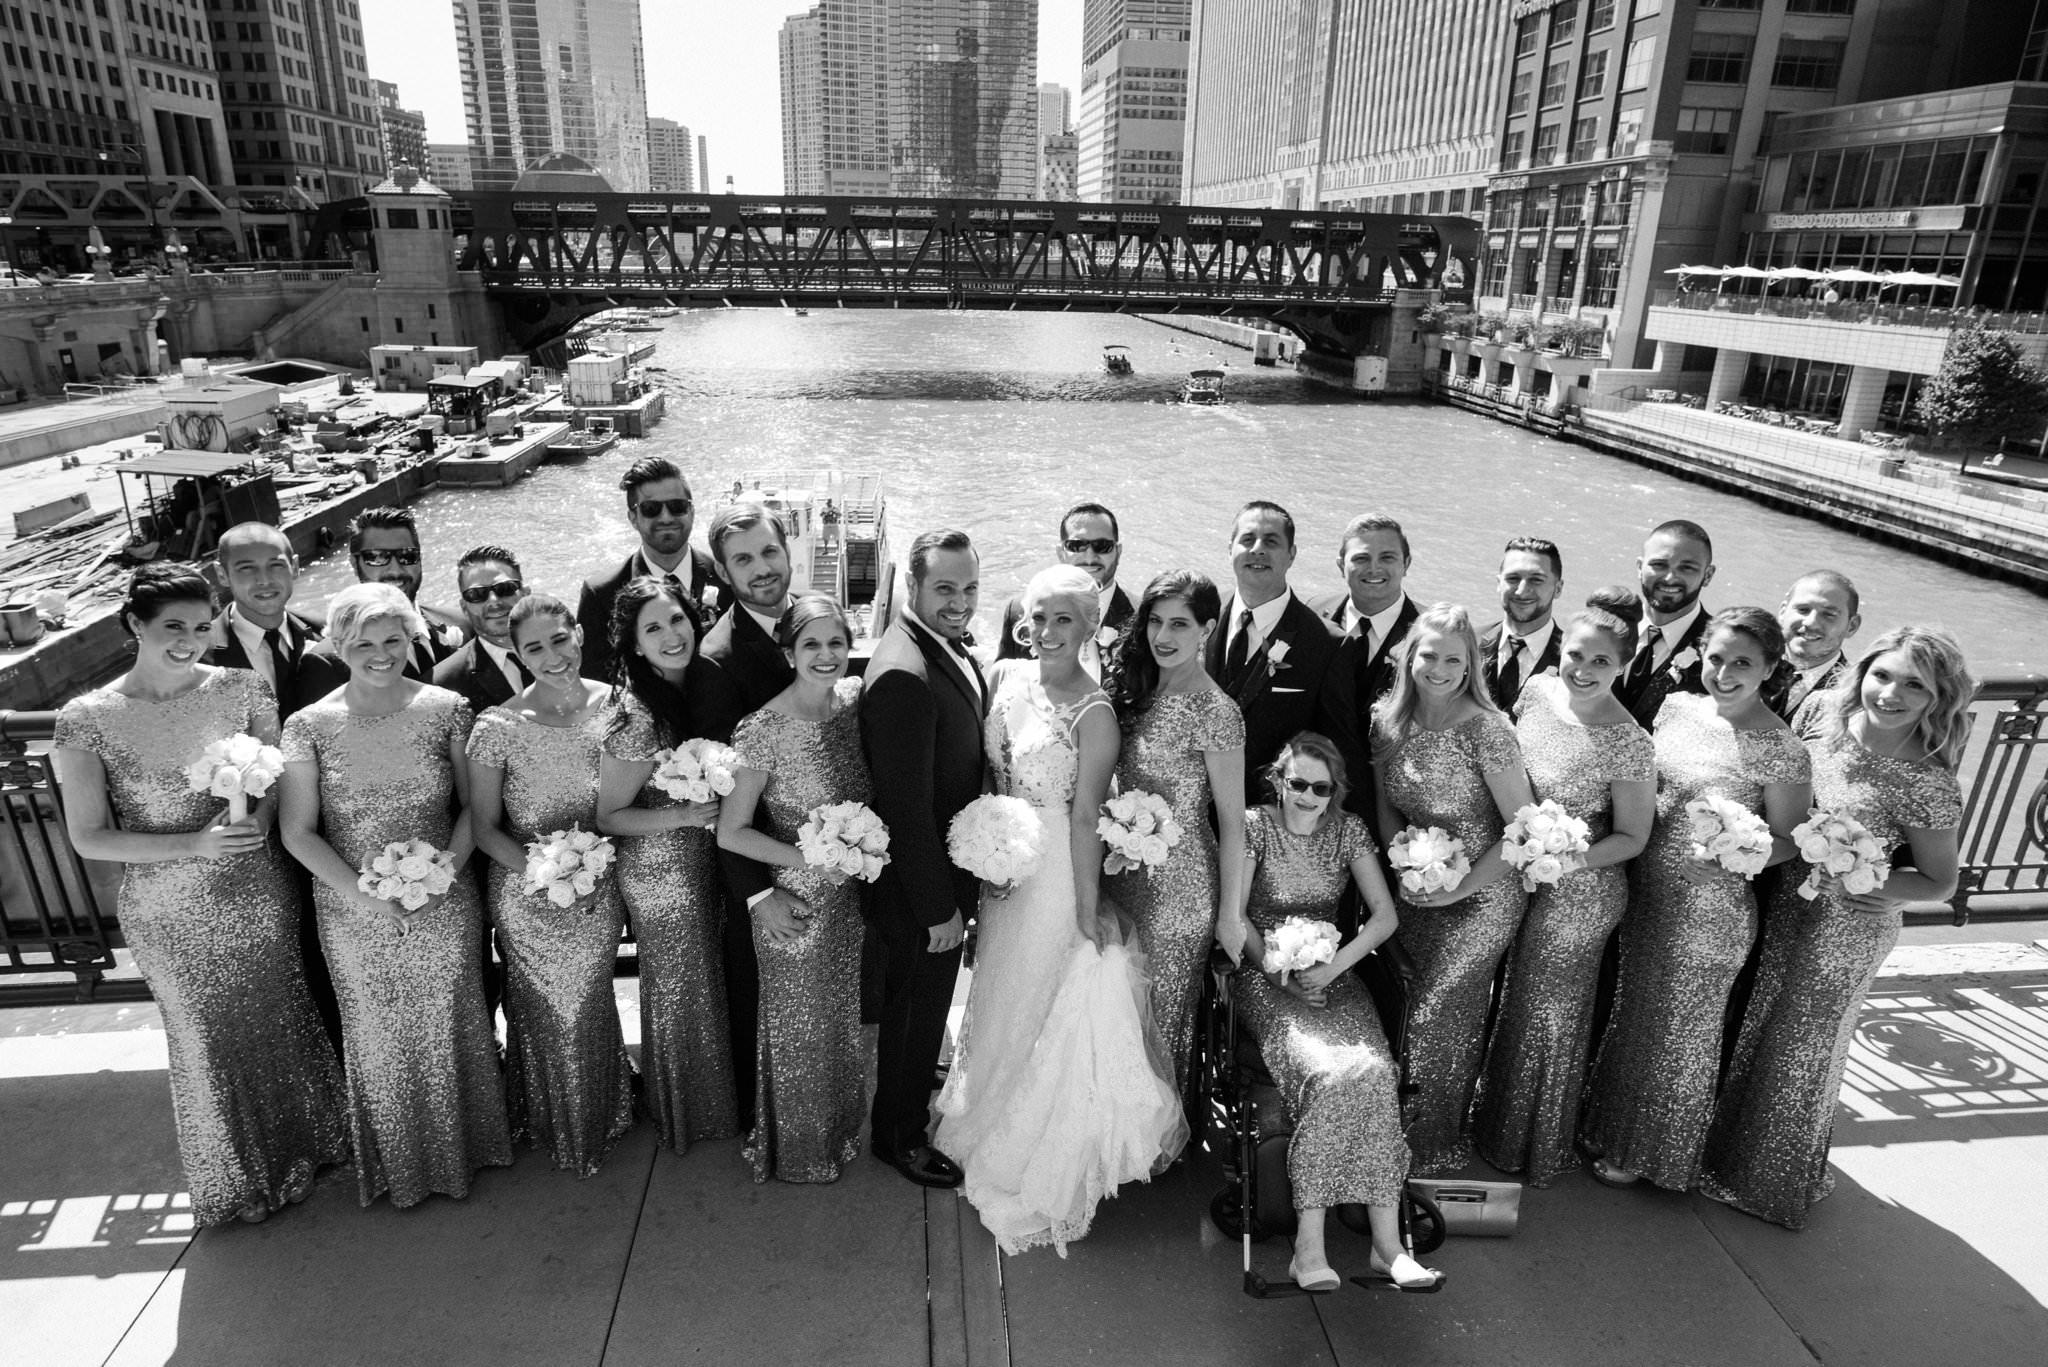 Adler-Planetarium-Chicago-Wedding-Photography-0033.JPG